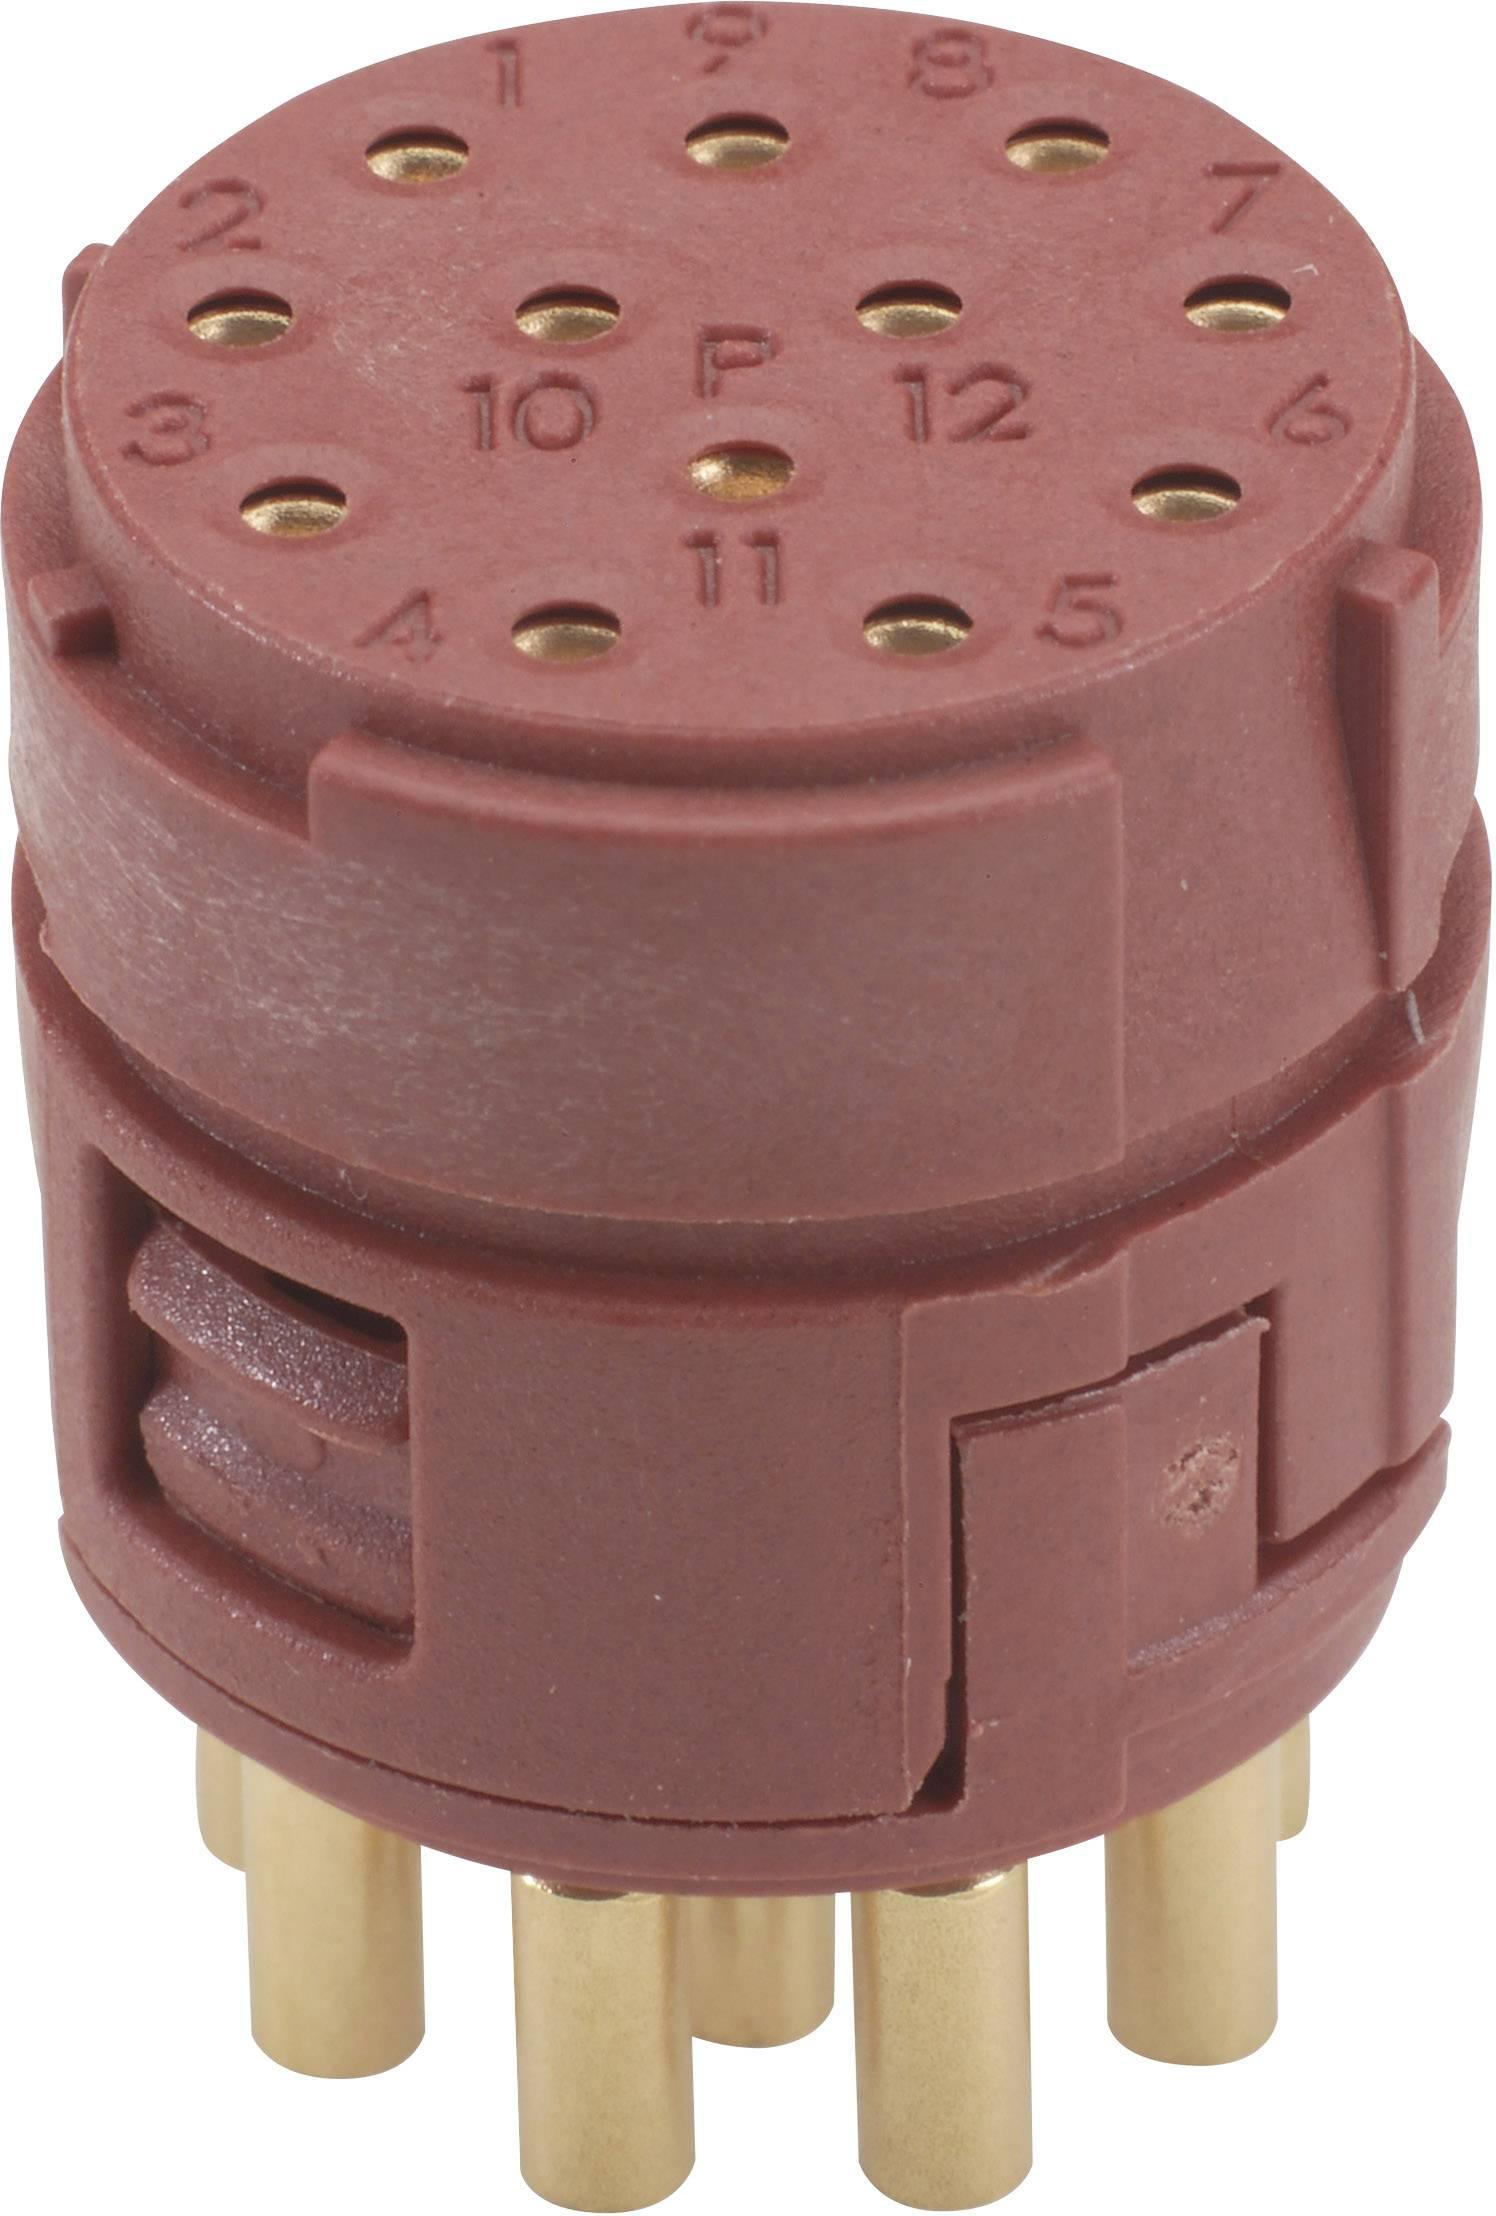 Sada EPIC® konektor M23 D6 kabelová zásuvka LAPP 75009710, 1 sada